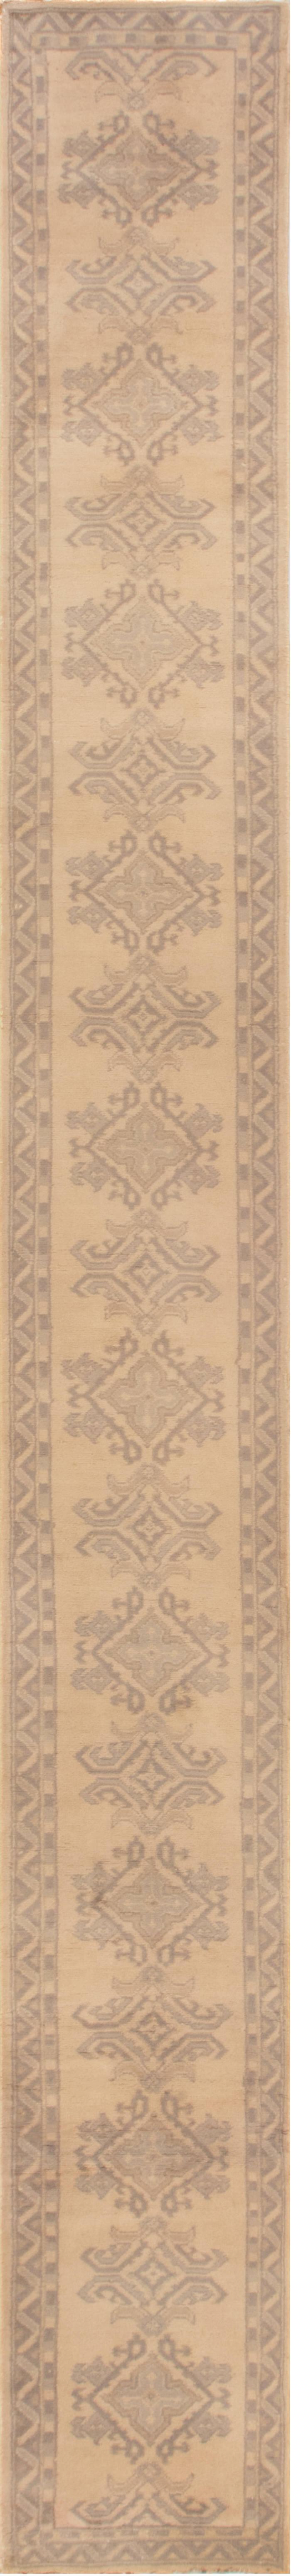 Antique Turkish Oushak Runner BB5359